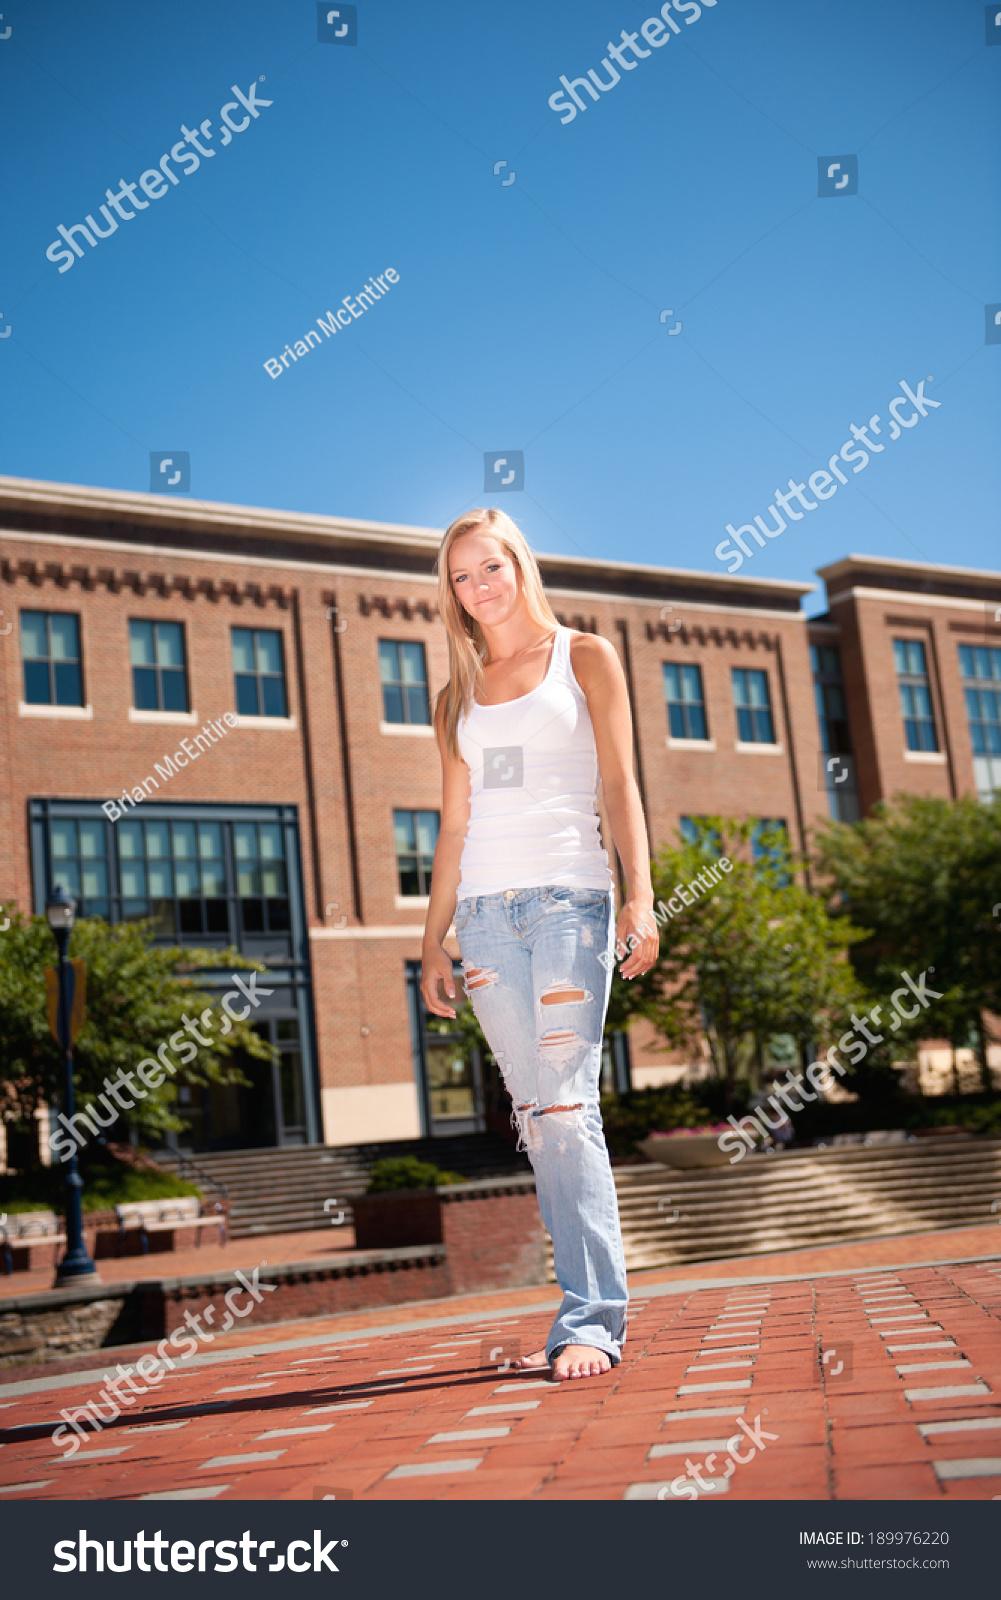 https://image.shutterstock.com/shutterstock/photos/189976220/display_1500/stock-photo-casual-young-woman-walking-barefoot-through-urban-setting-189976220.jpg